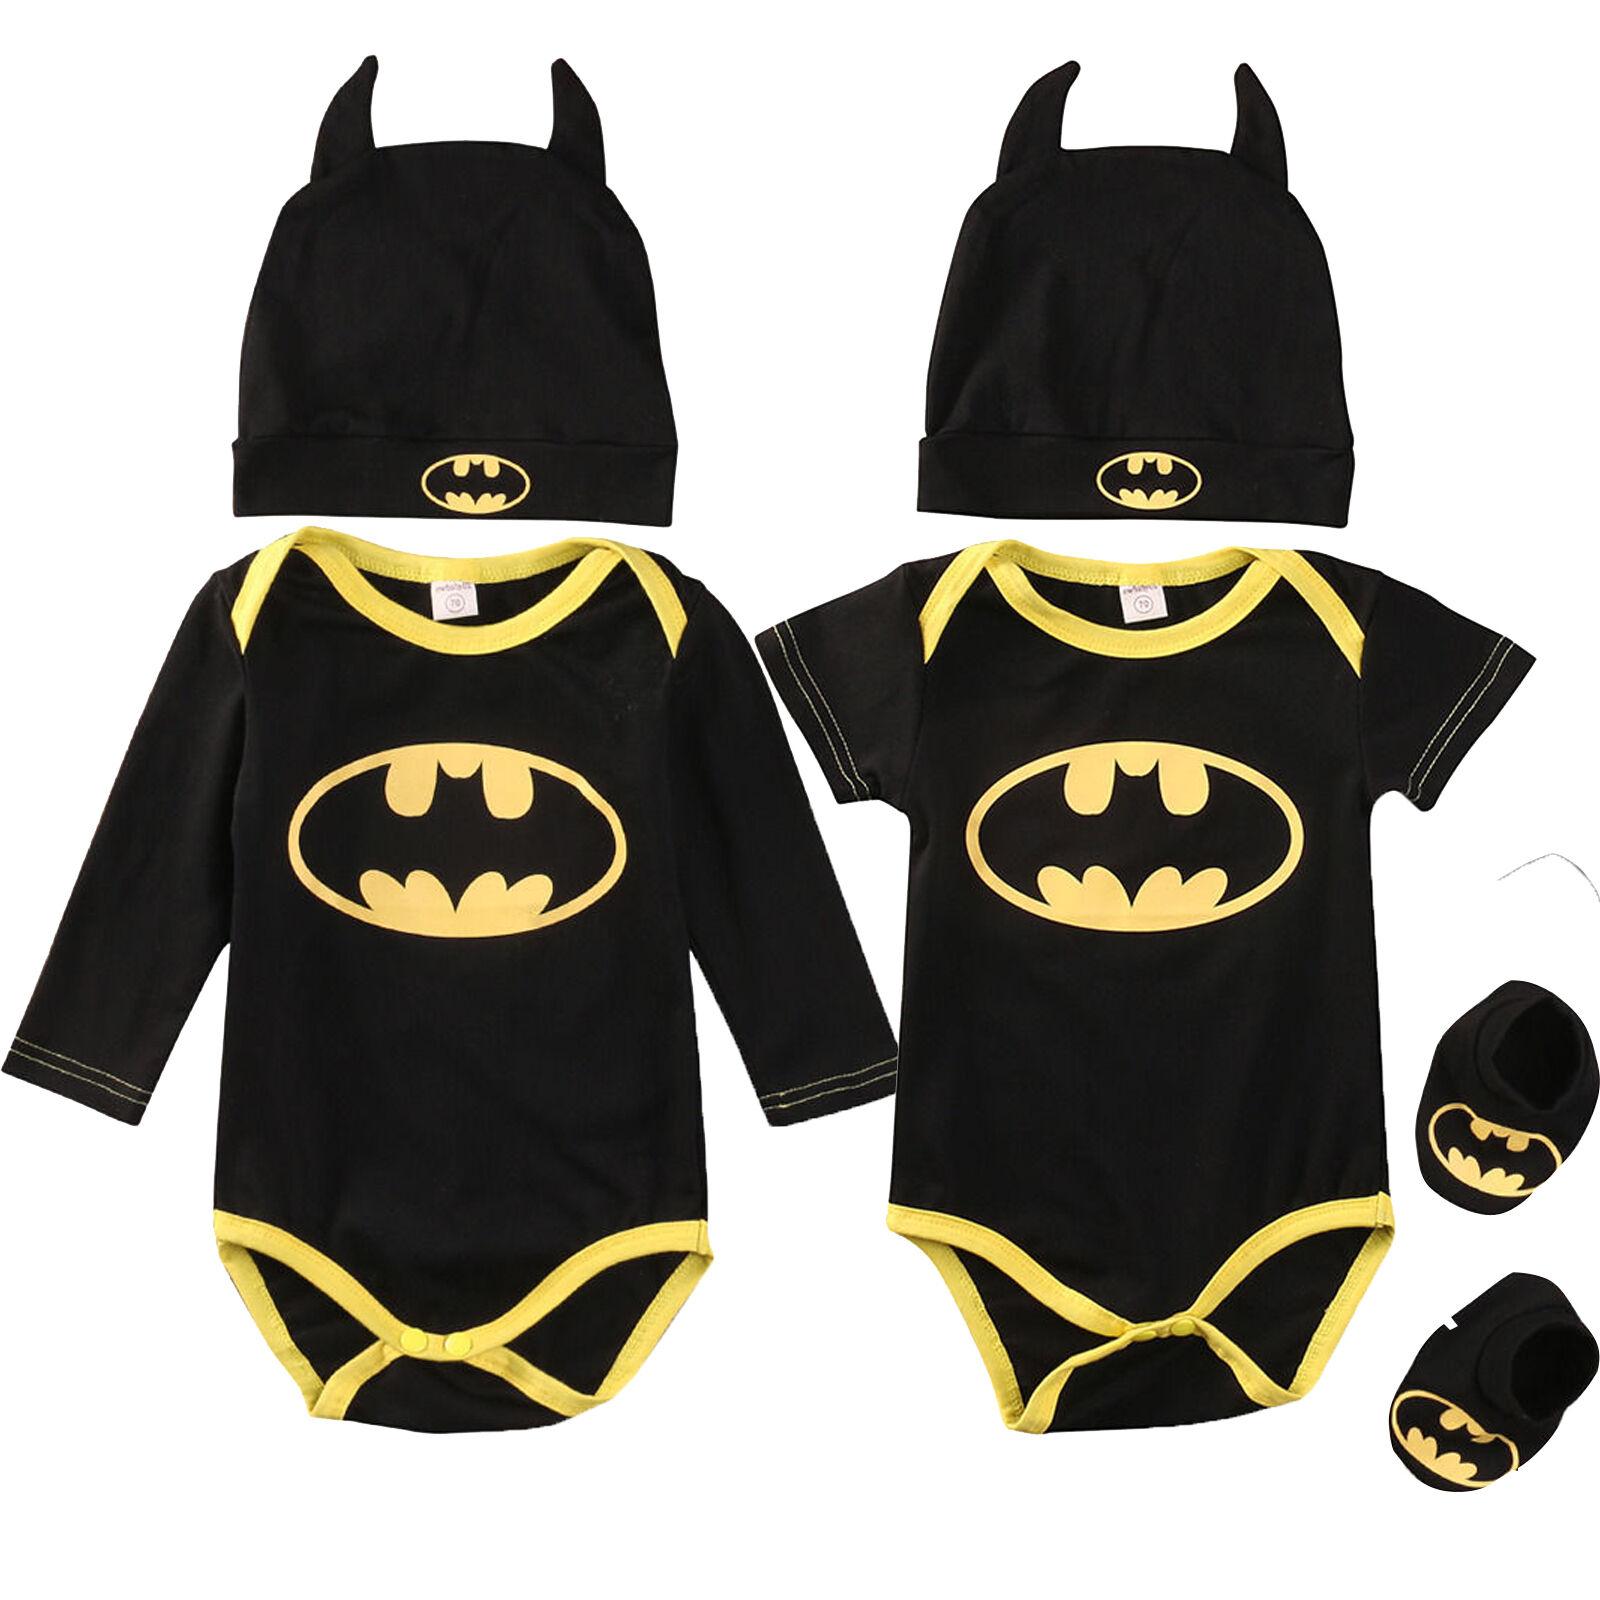 Newborn Baby Boy Batman Outfit Babygrow Romper+Socks Shoes+Hat  3Pcs Set Clothes